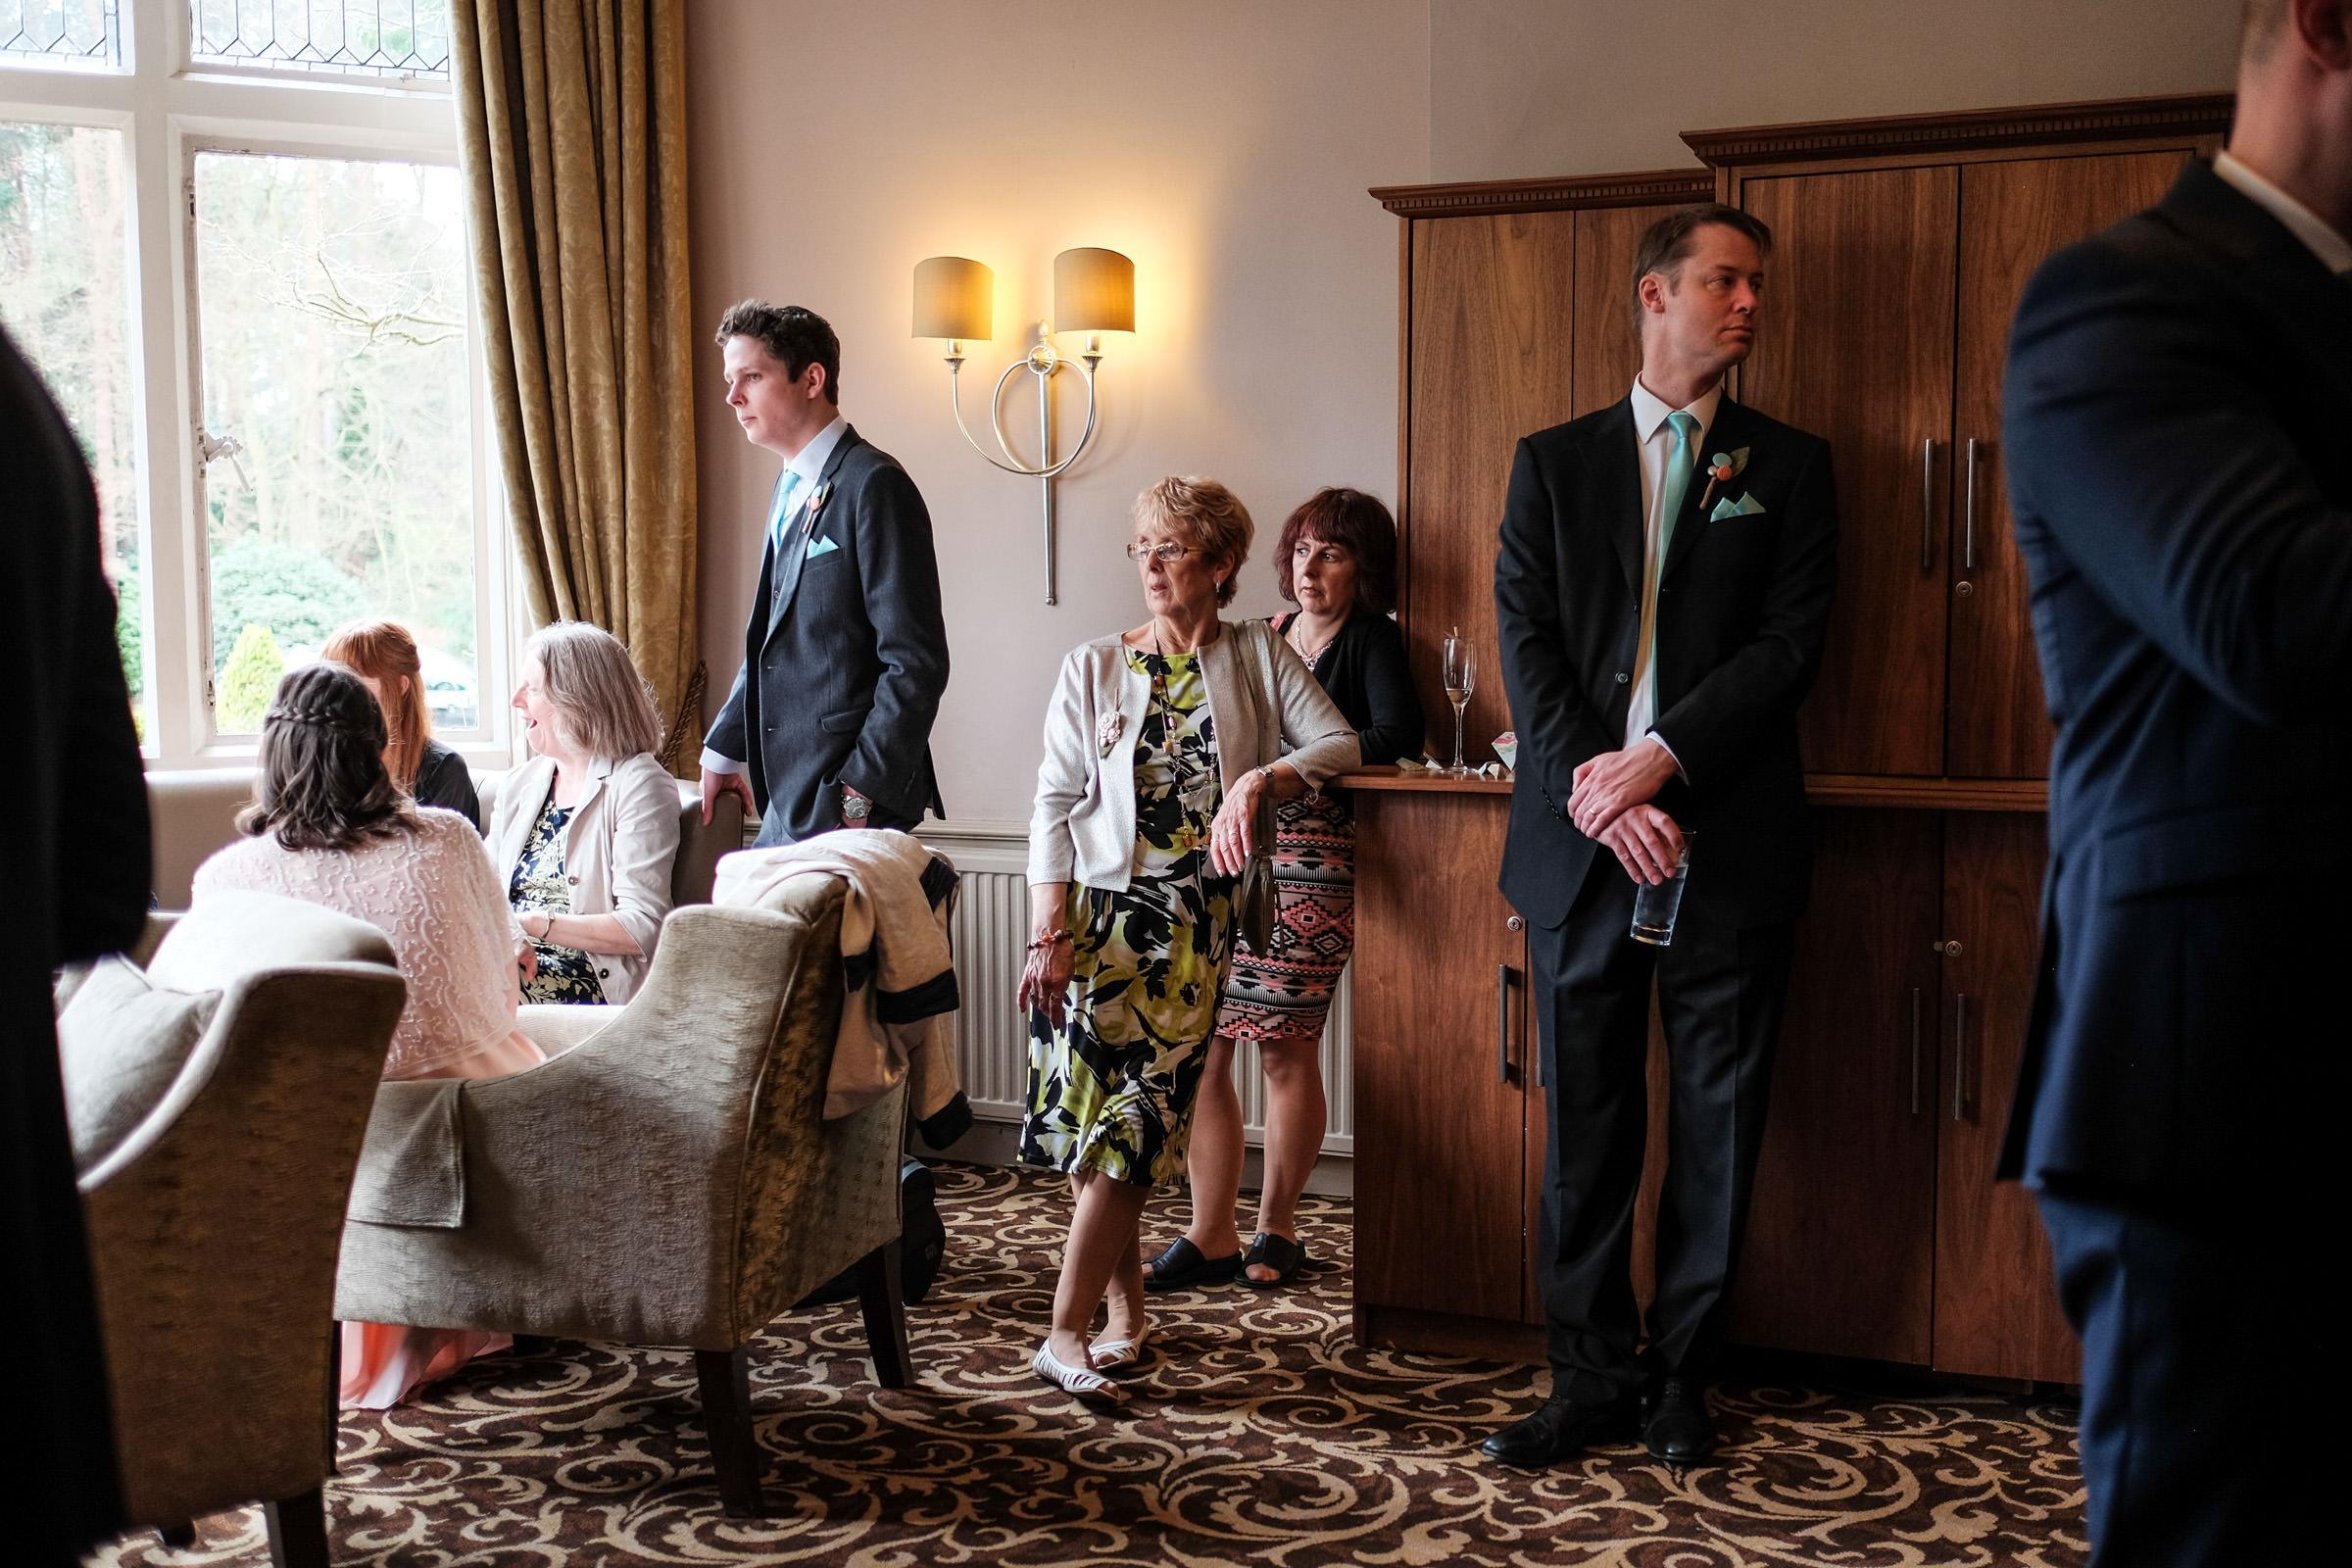 Wedding at Royal Holloway University in Surrey 019.jpg